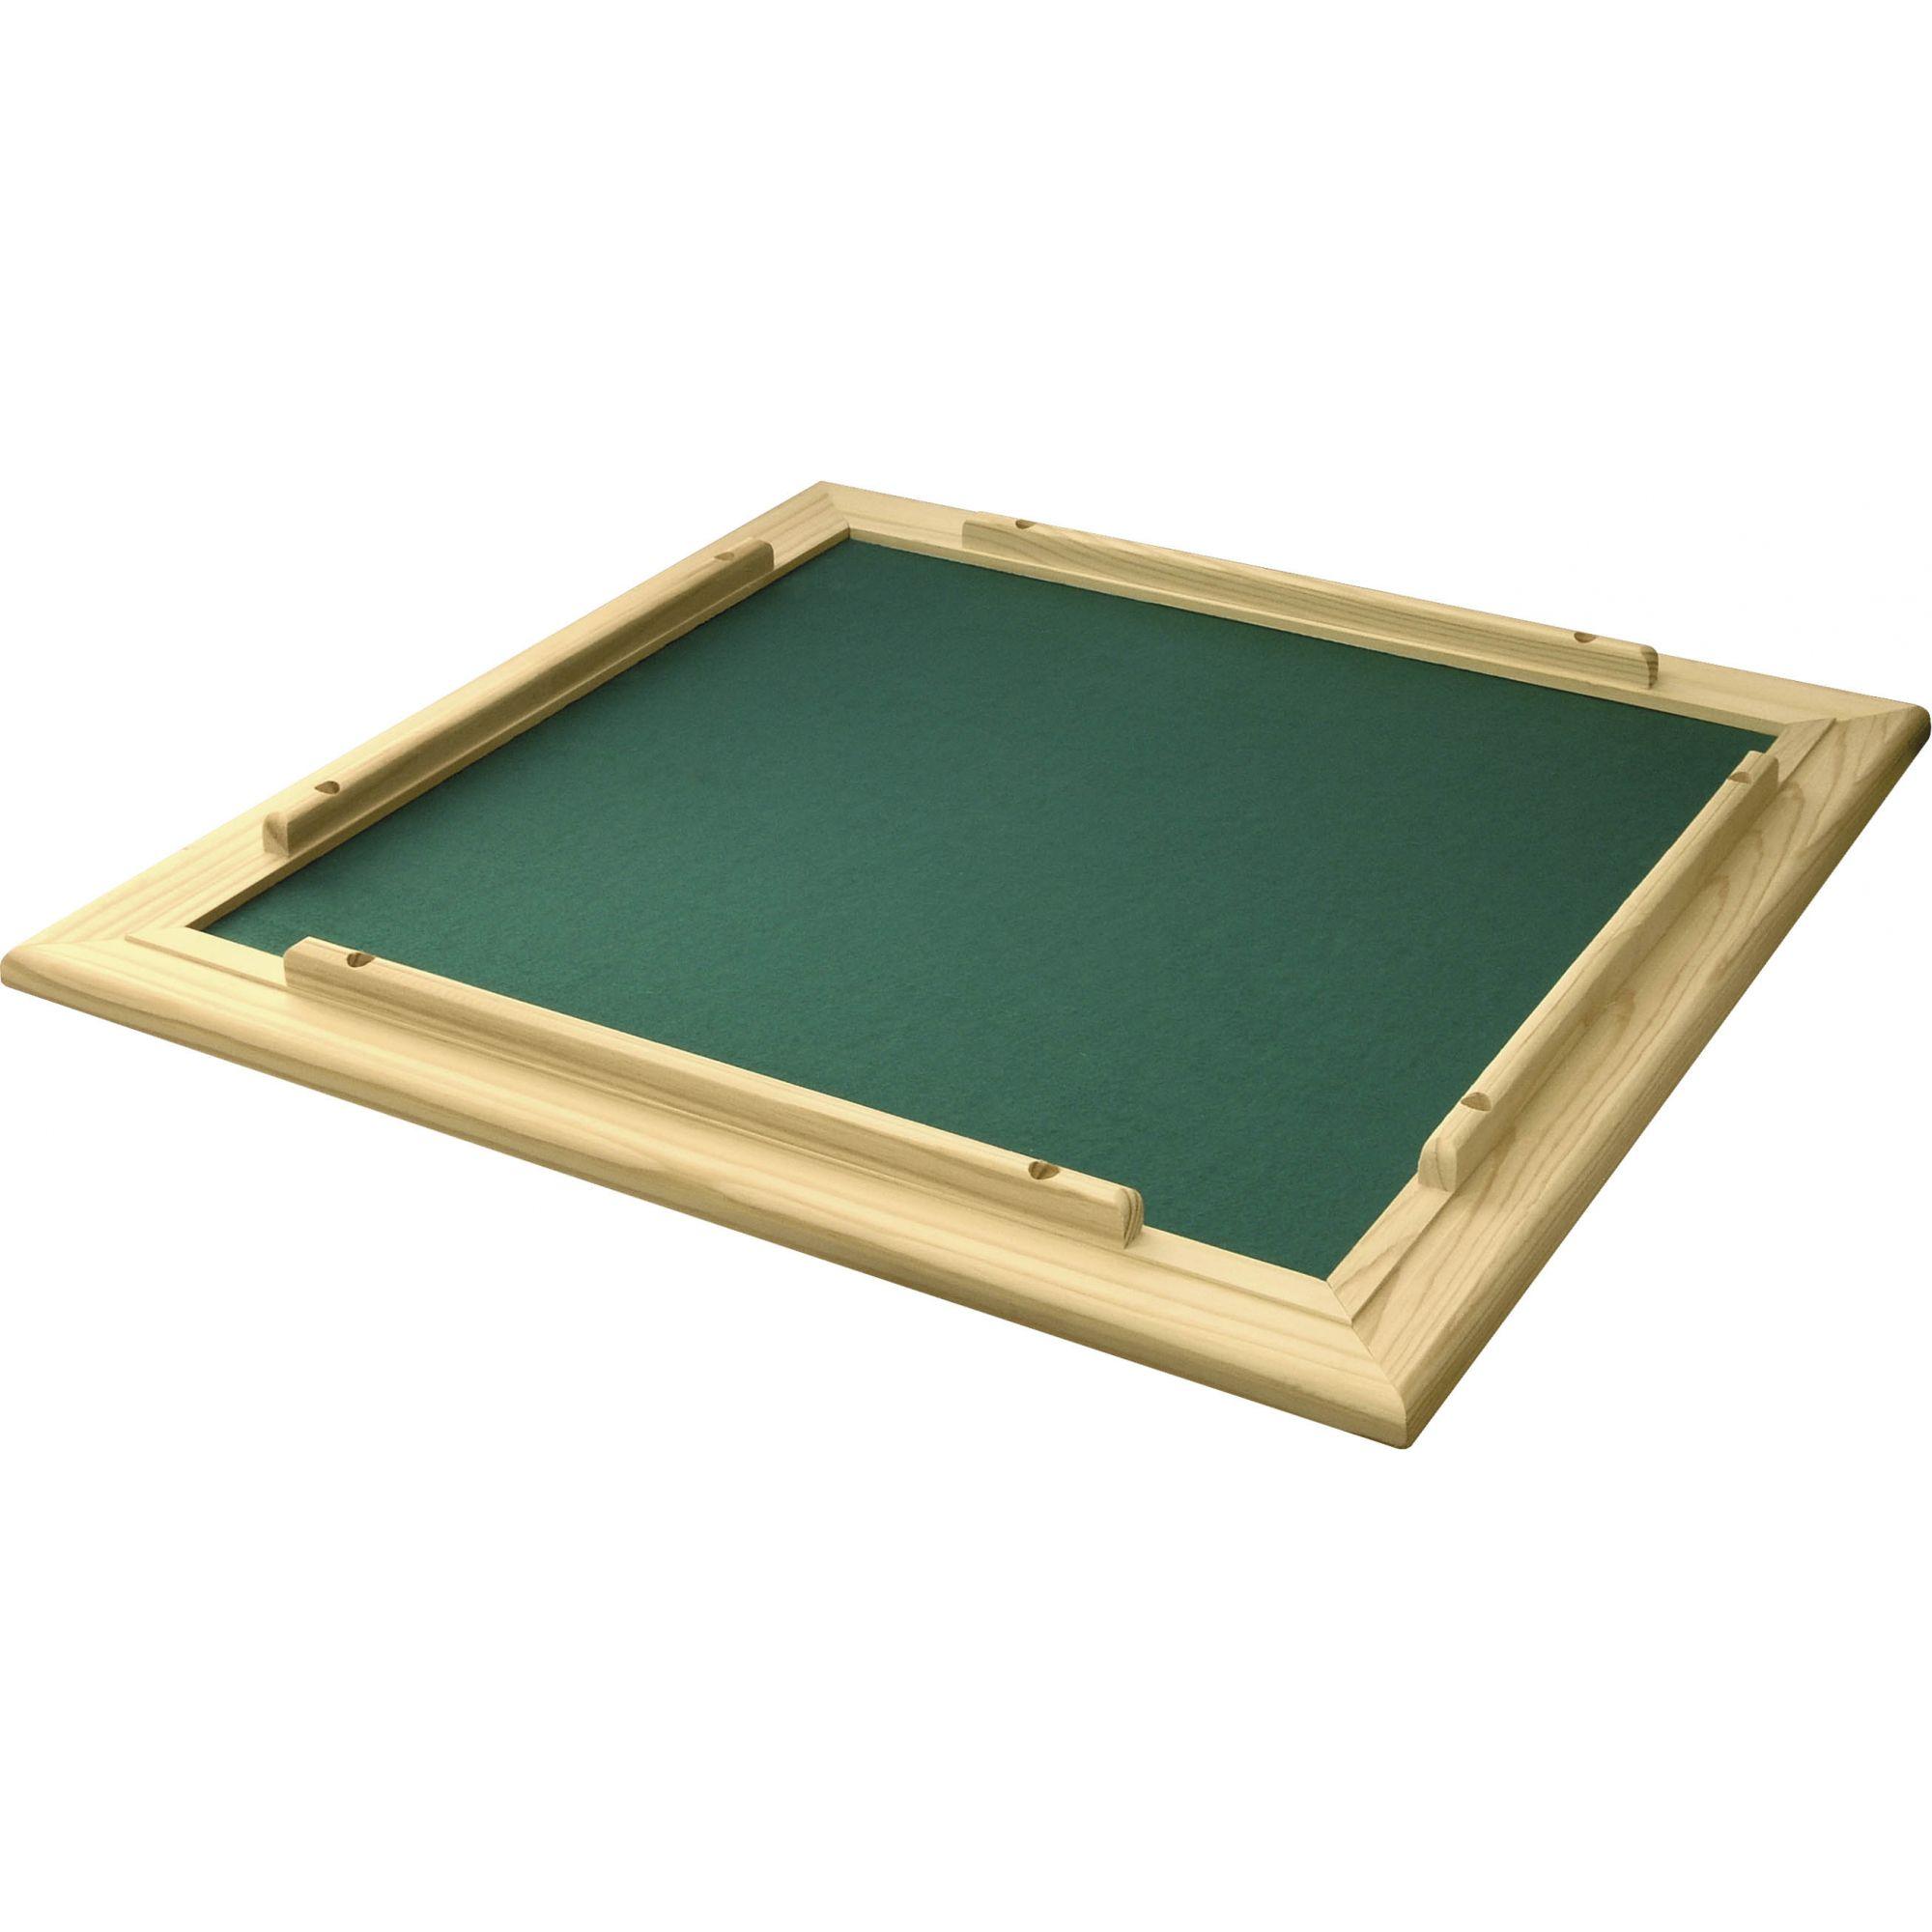 CONJ 2 Tabuleiros de Mesa Para DOMINÓ Com Feltro Verde 66x66 cm 7009